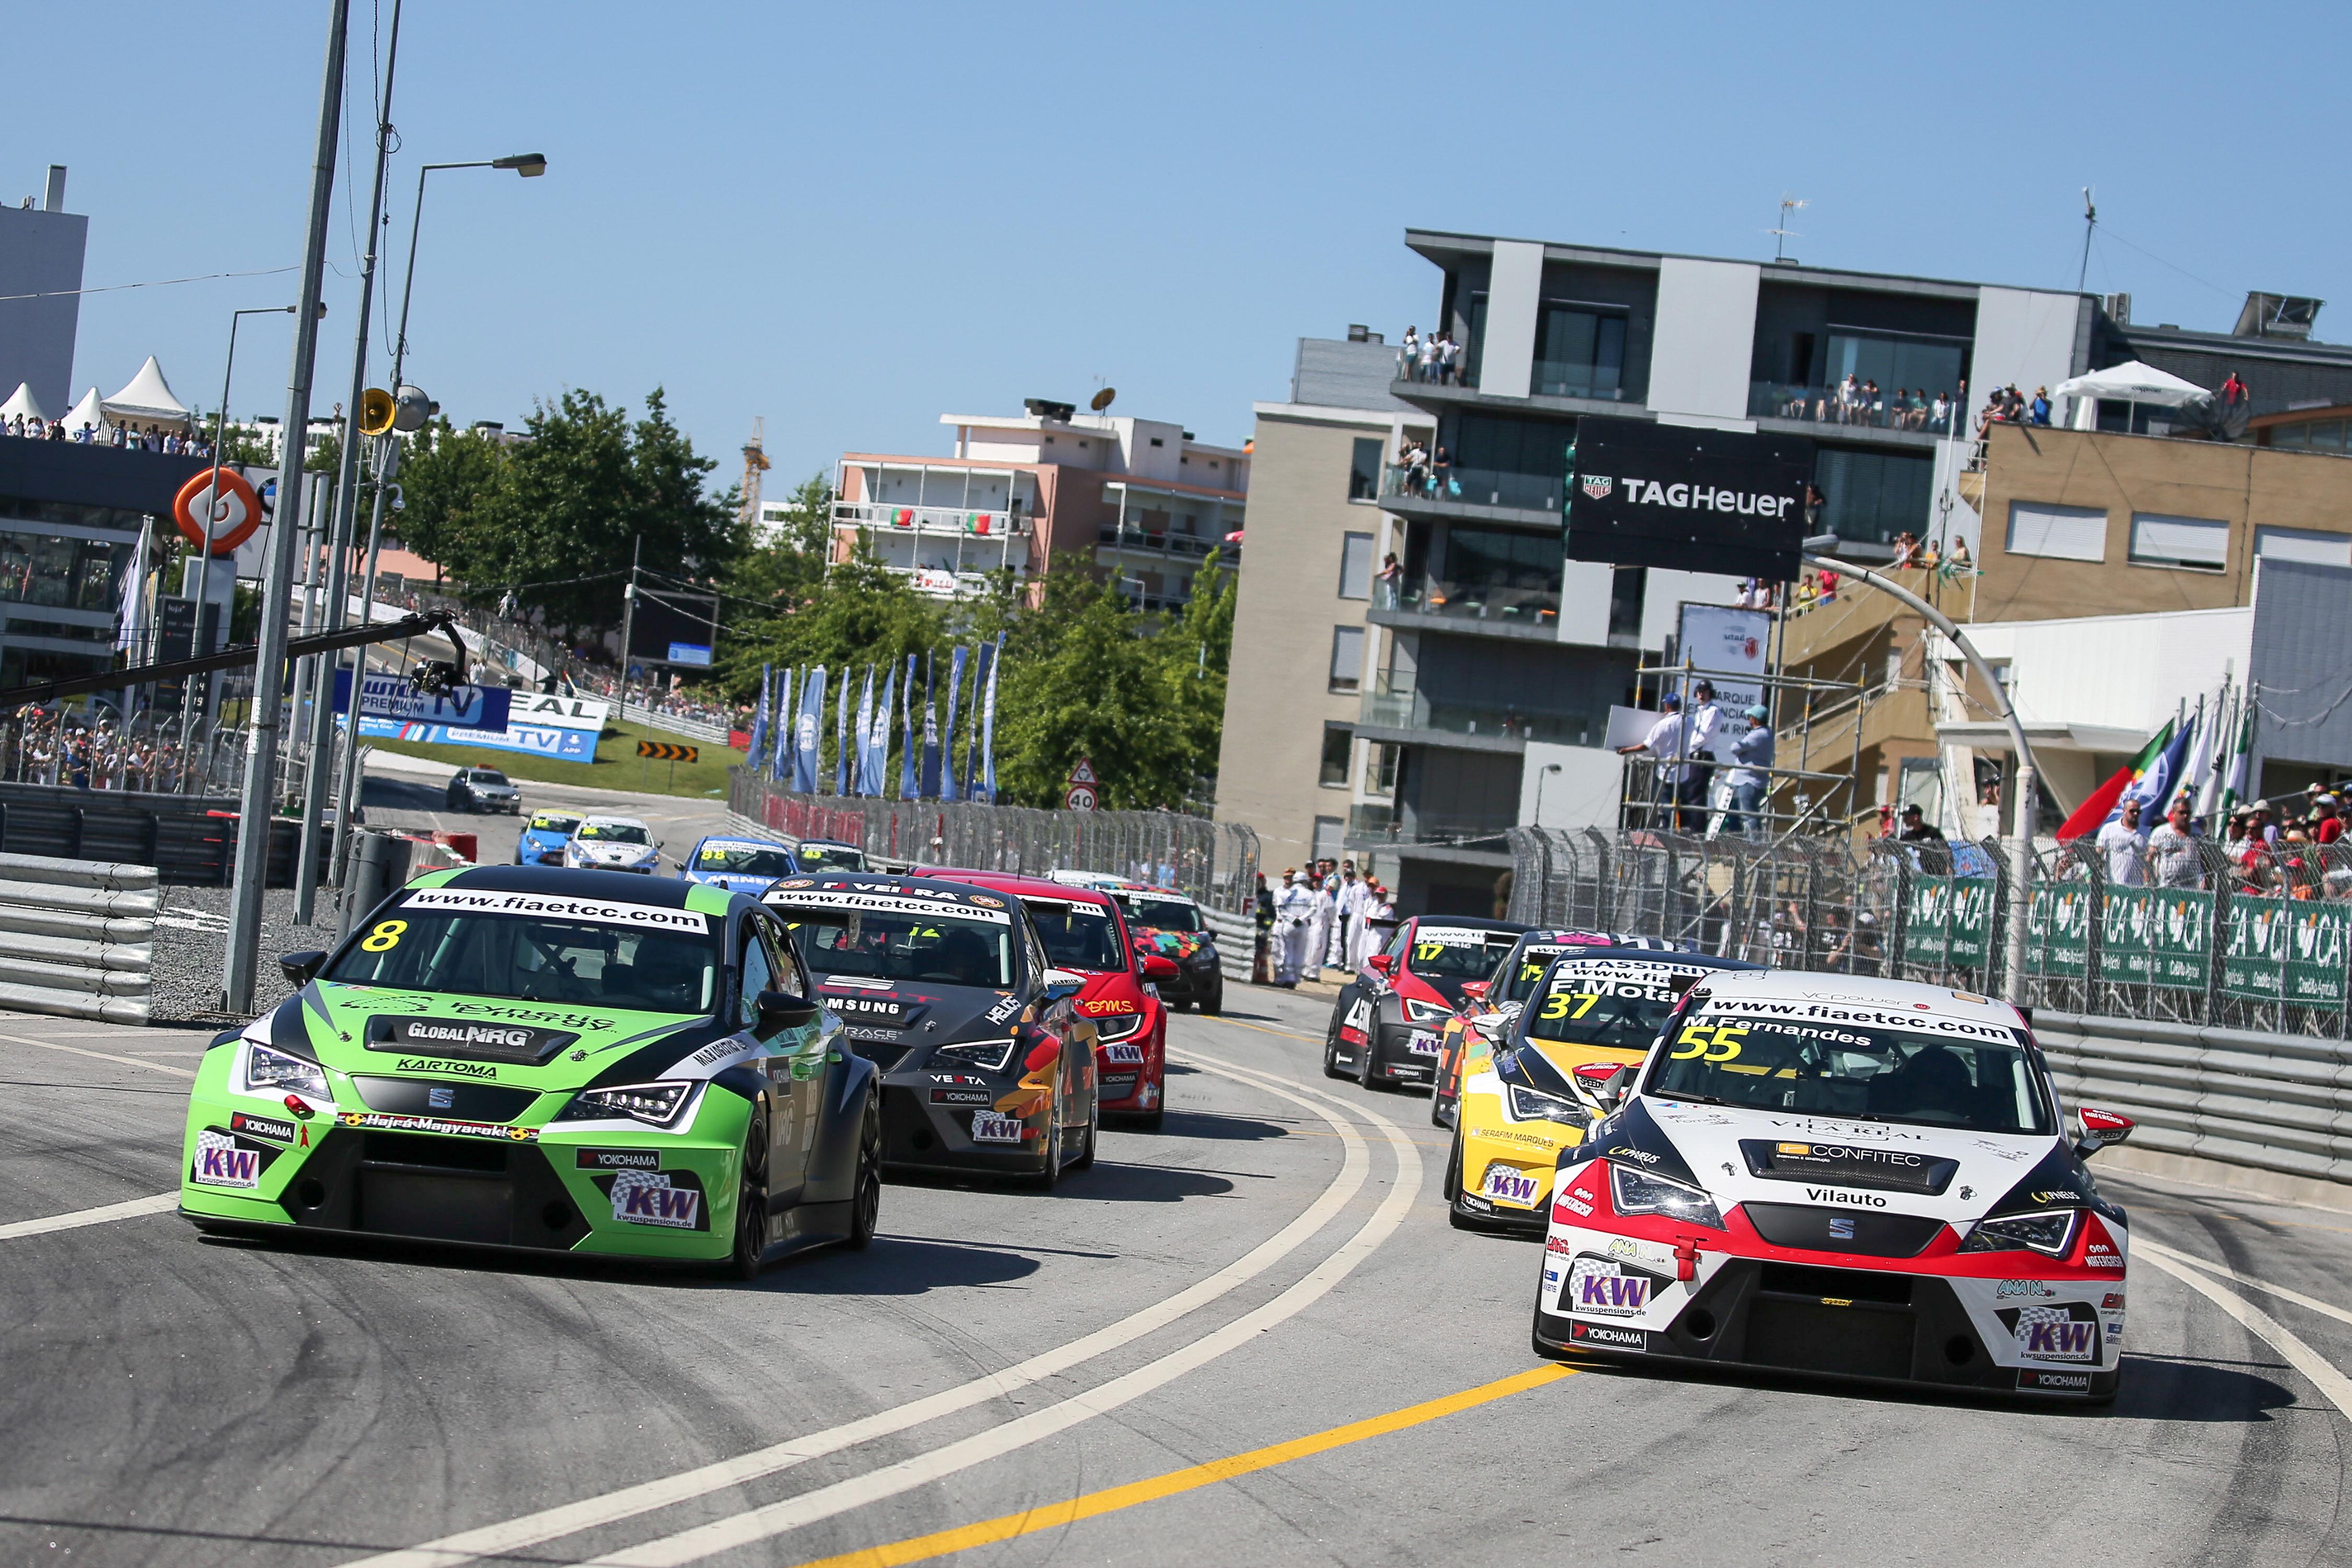 Circuito Vila Real : Kevin hilgenhövel driver news photos videos and